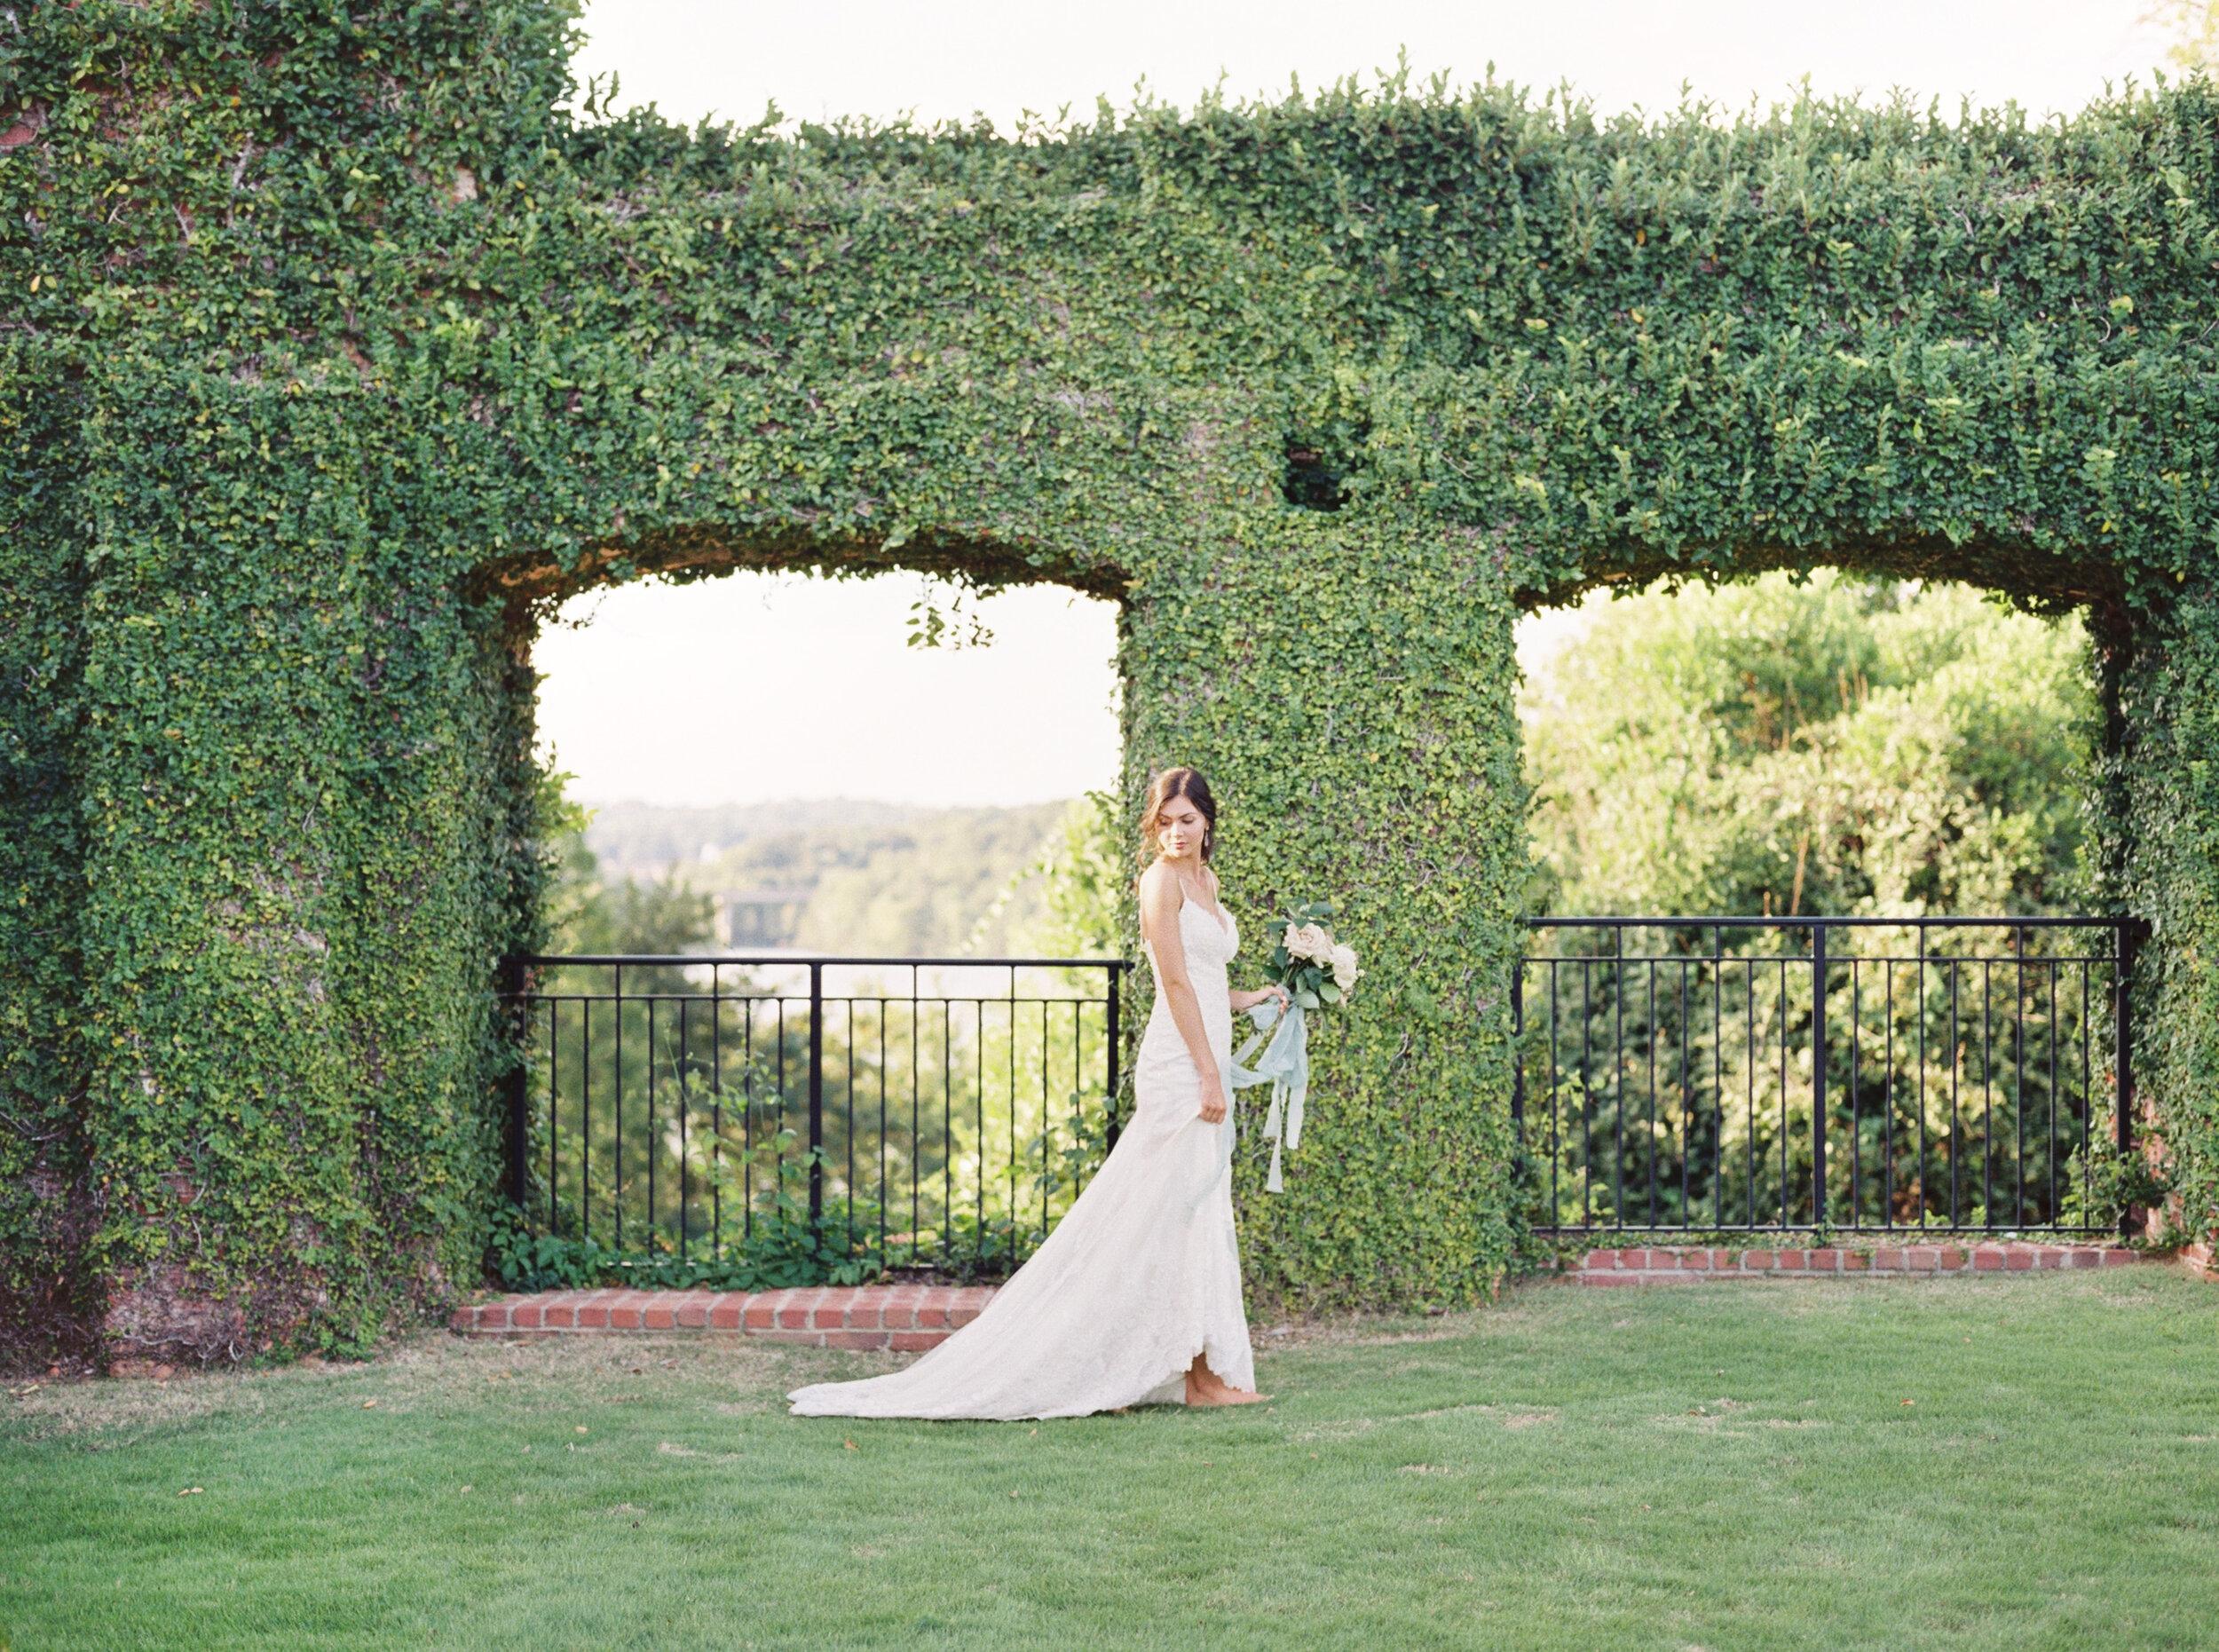 Bibb_Mill_Wedding_Editorial_Columbus_Georgia_Fallen_Photography_6-85.JPG